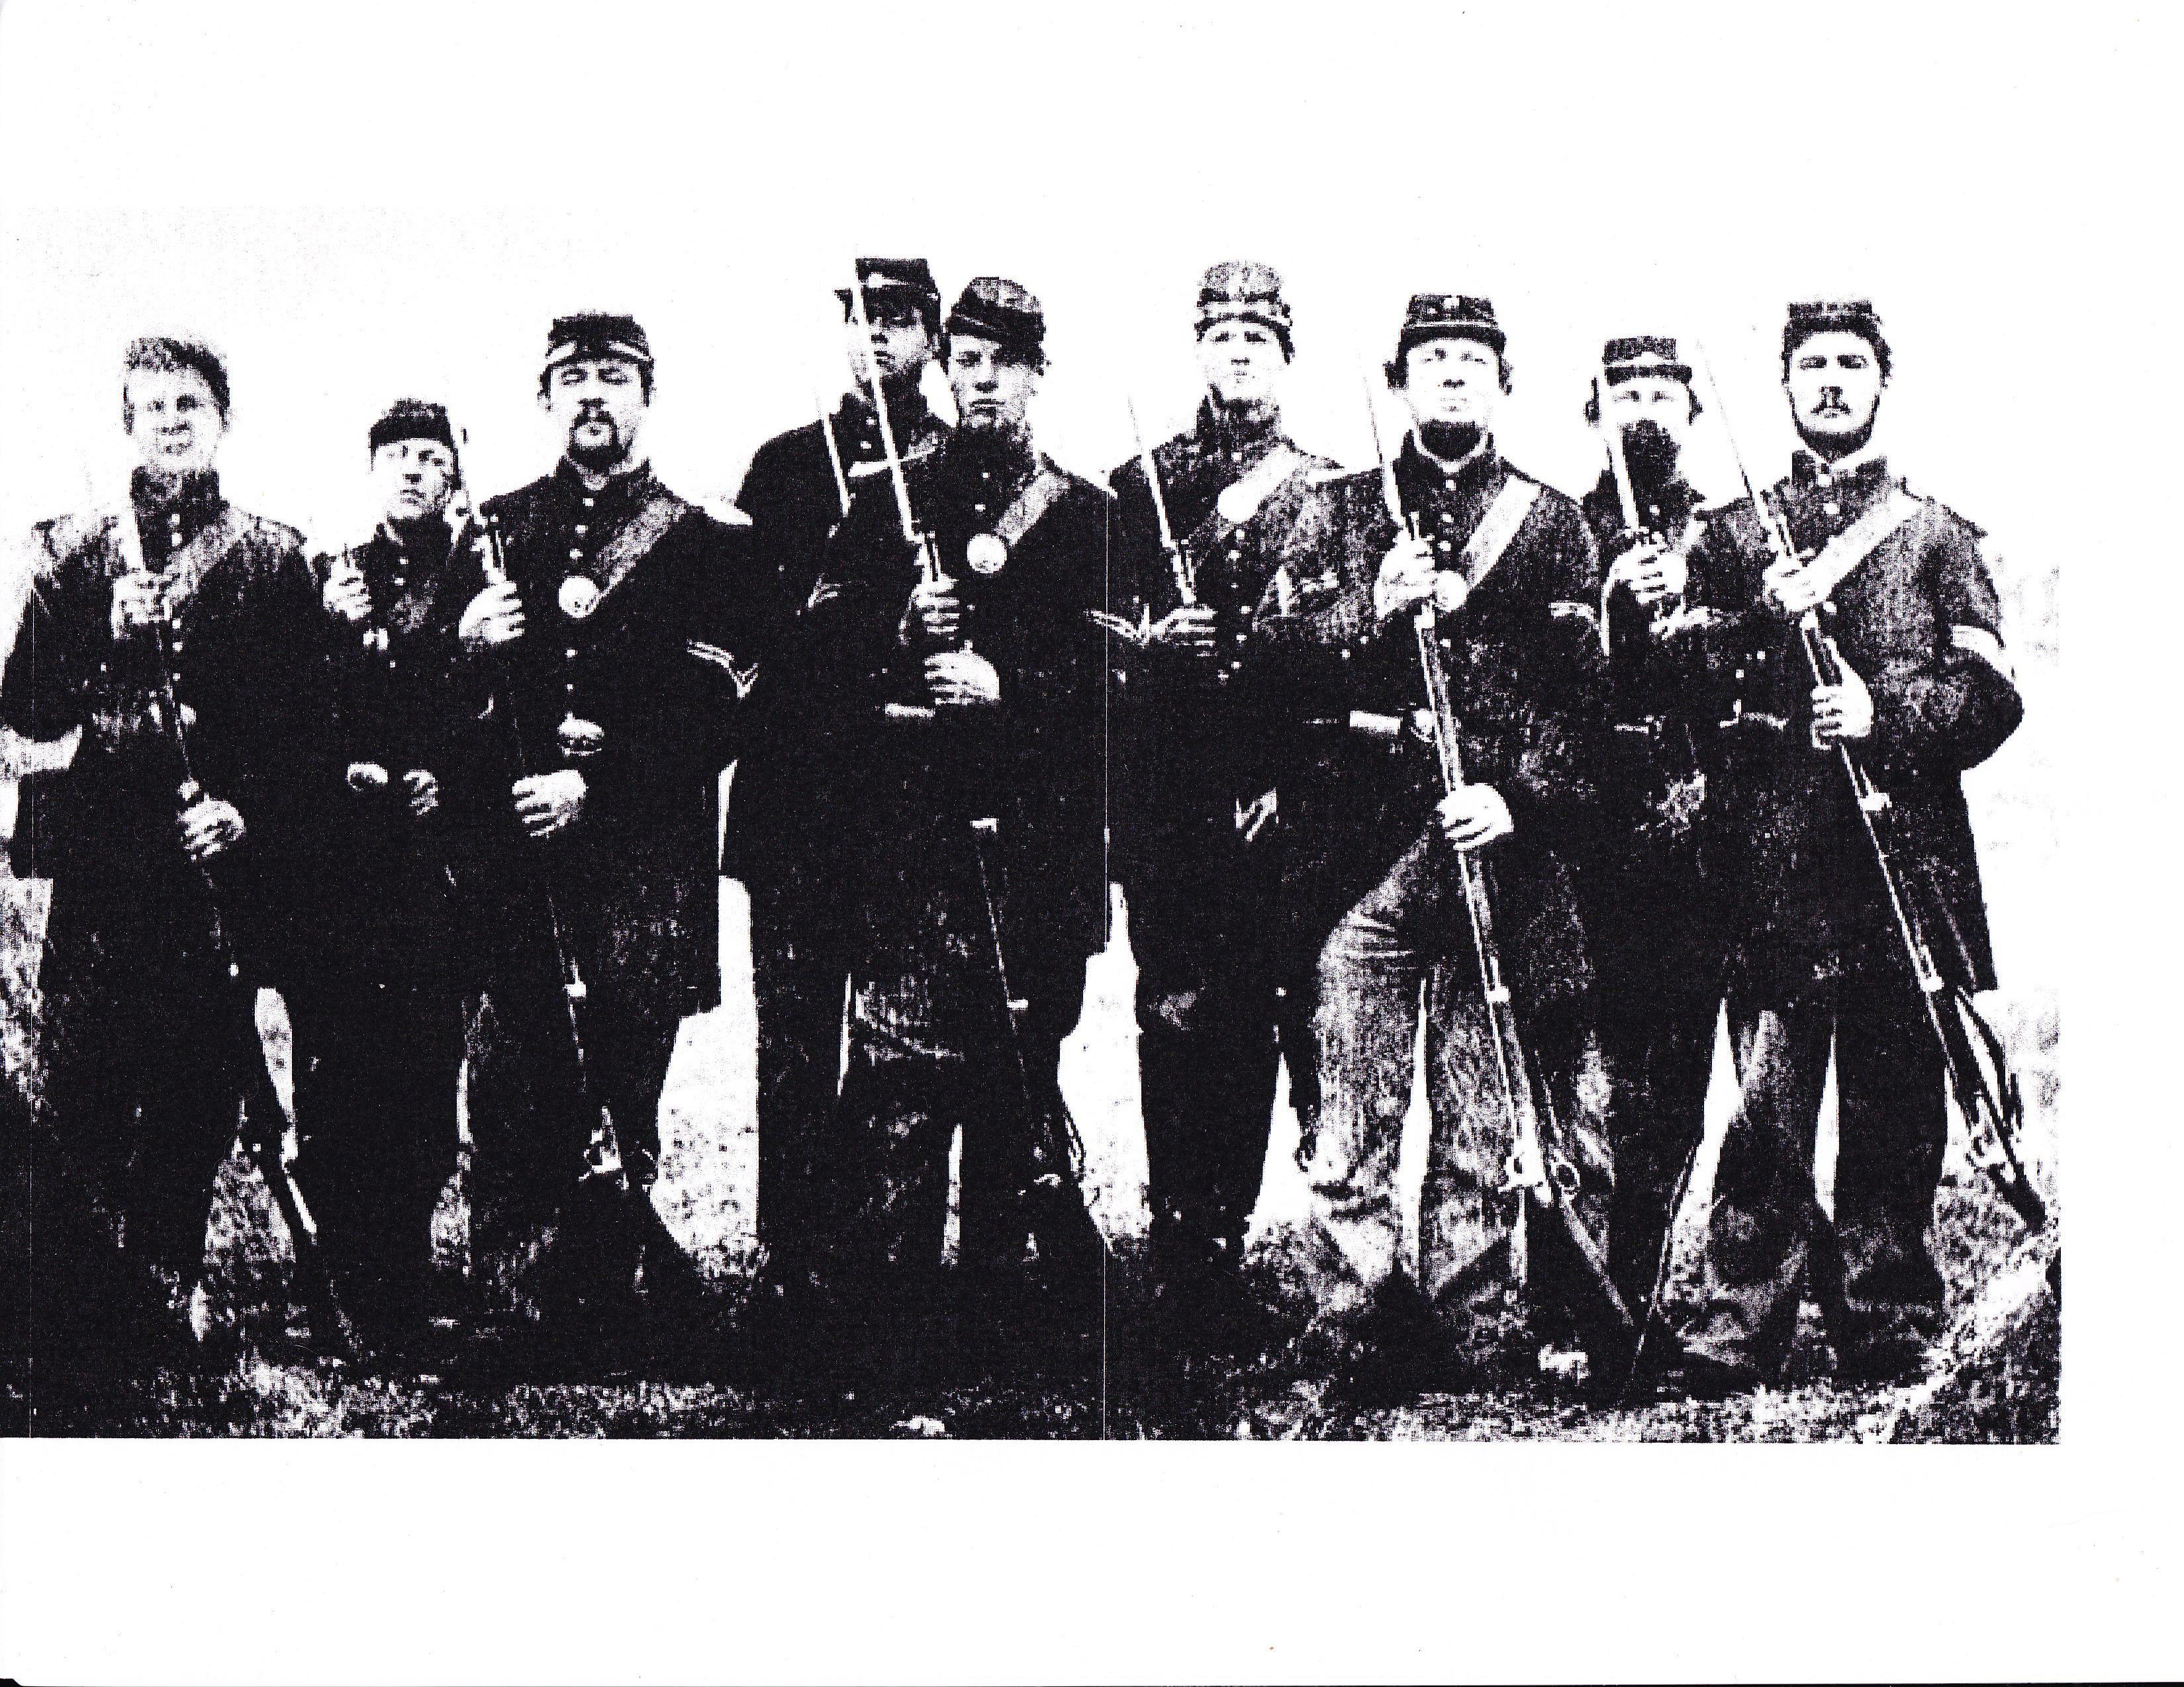 The 57th Massachusetts Infantry Civil War My Relitive Carlos Augustus Helmesd In Battle